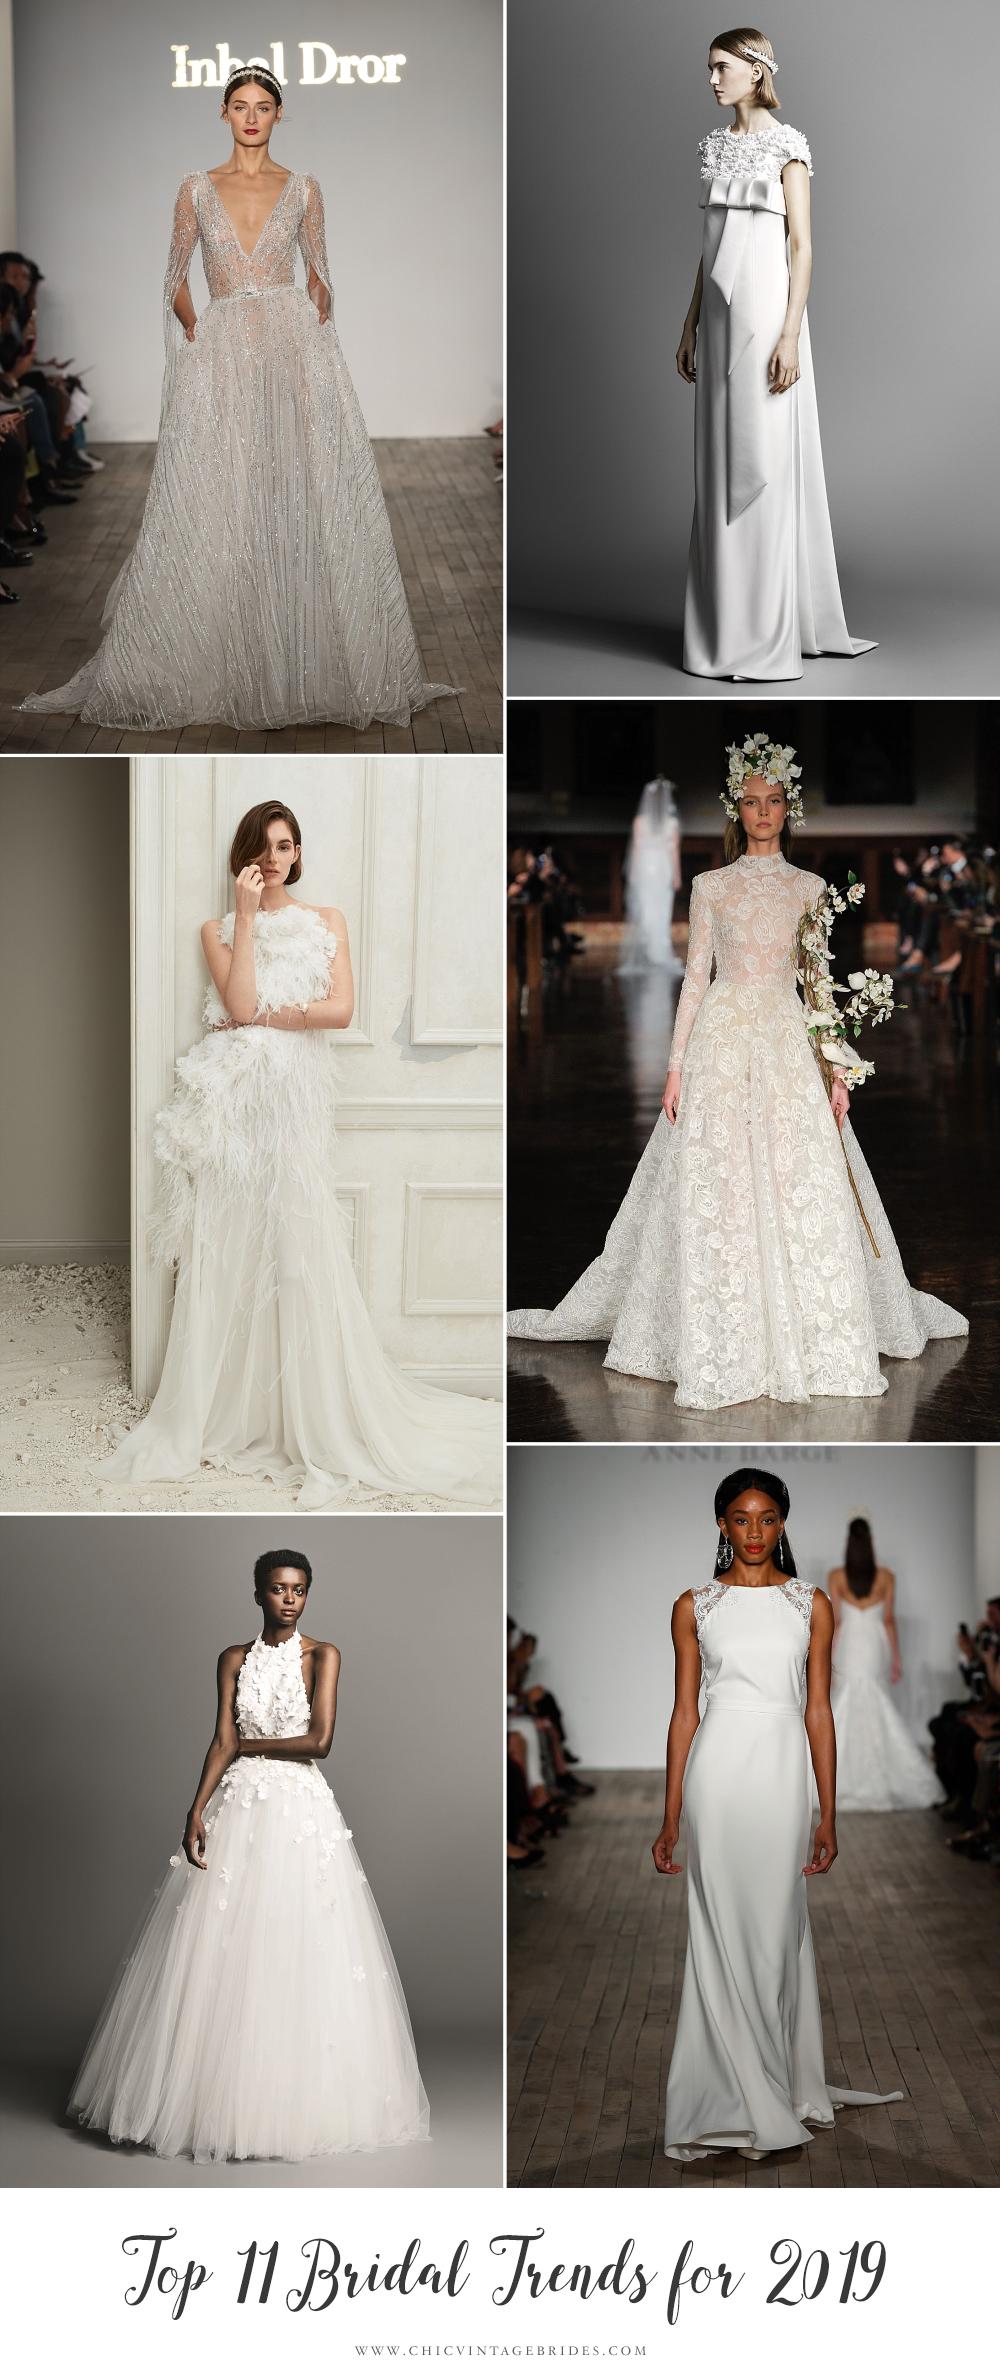 Most Beautiful 2019 Bridal Trends